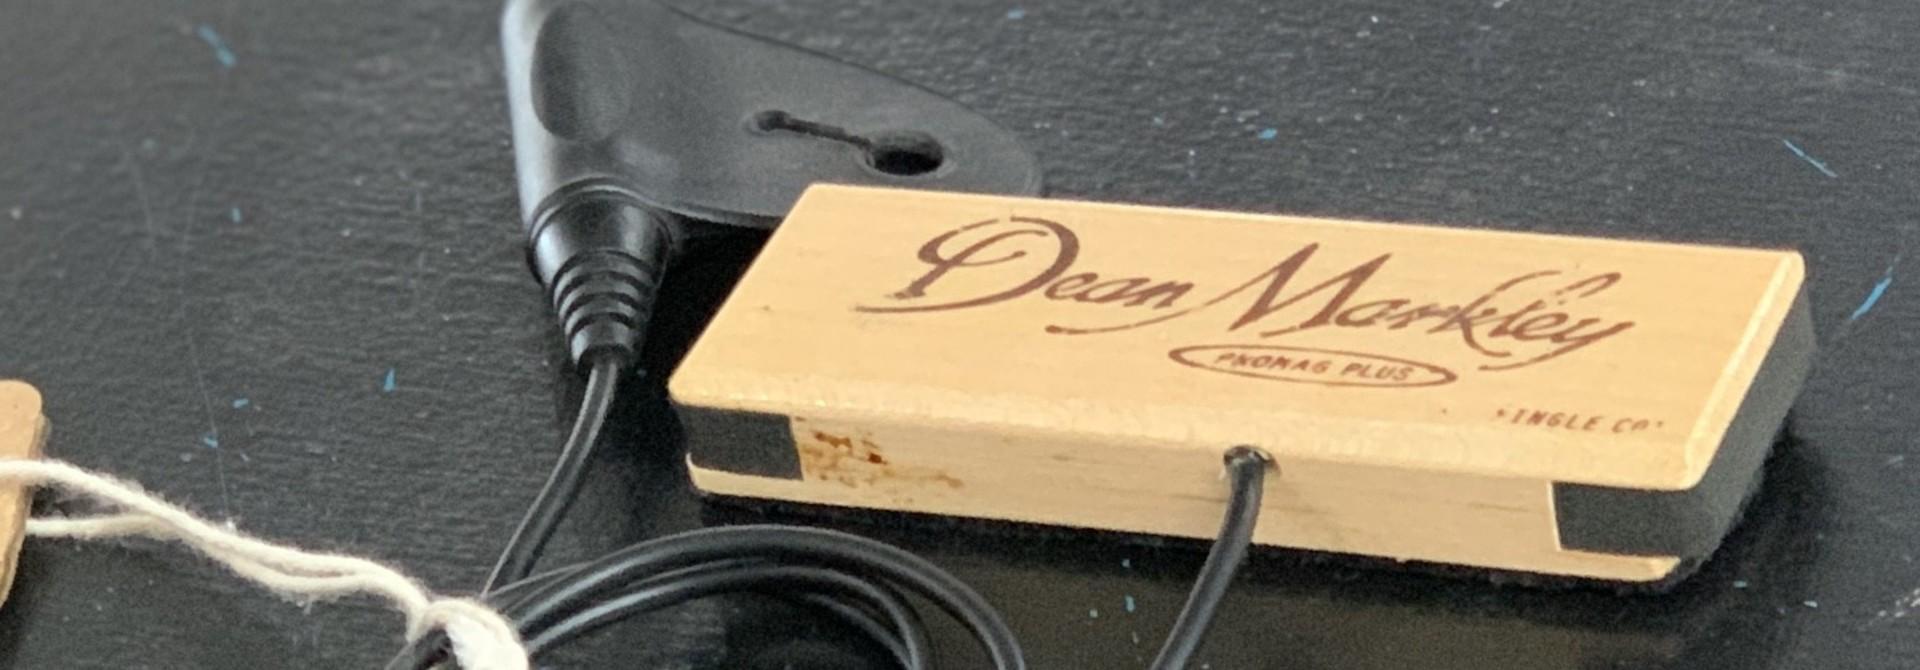 Dean Markley Promag Plus (Single Coil) [Used]